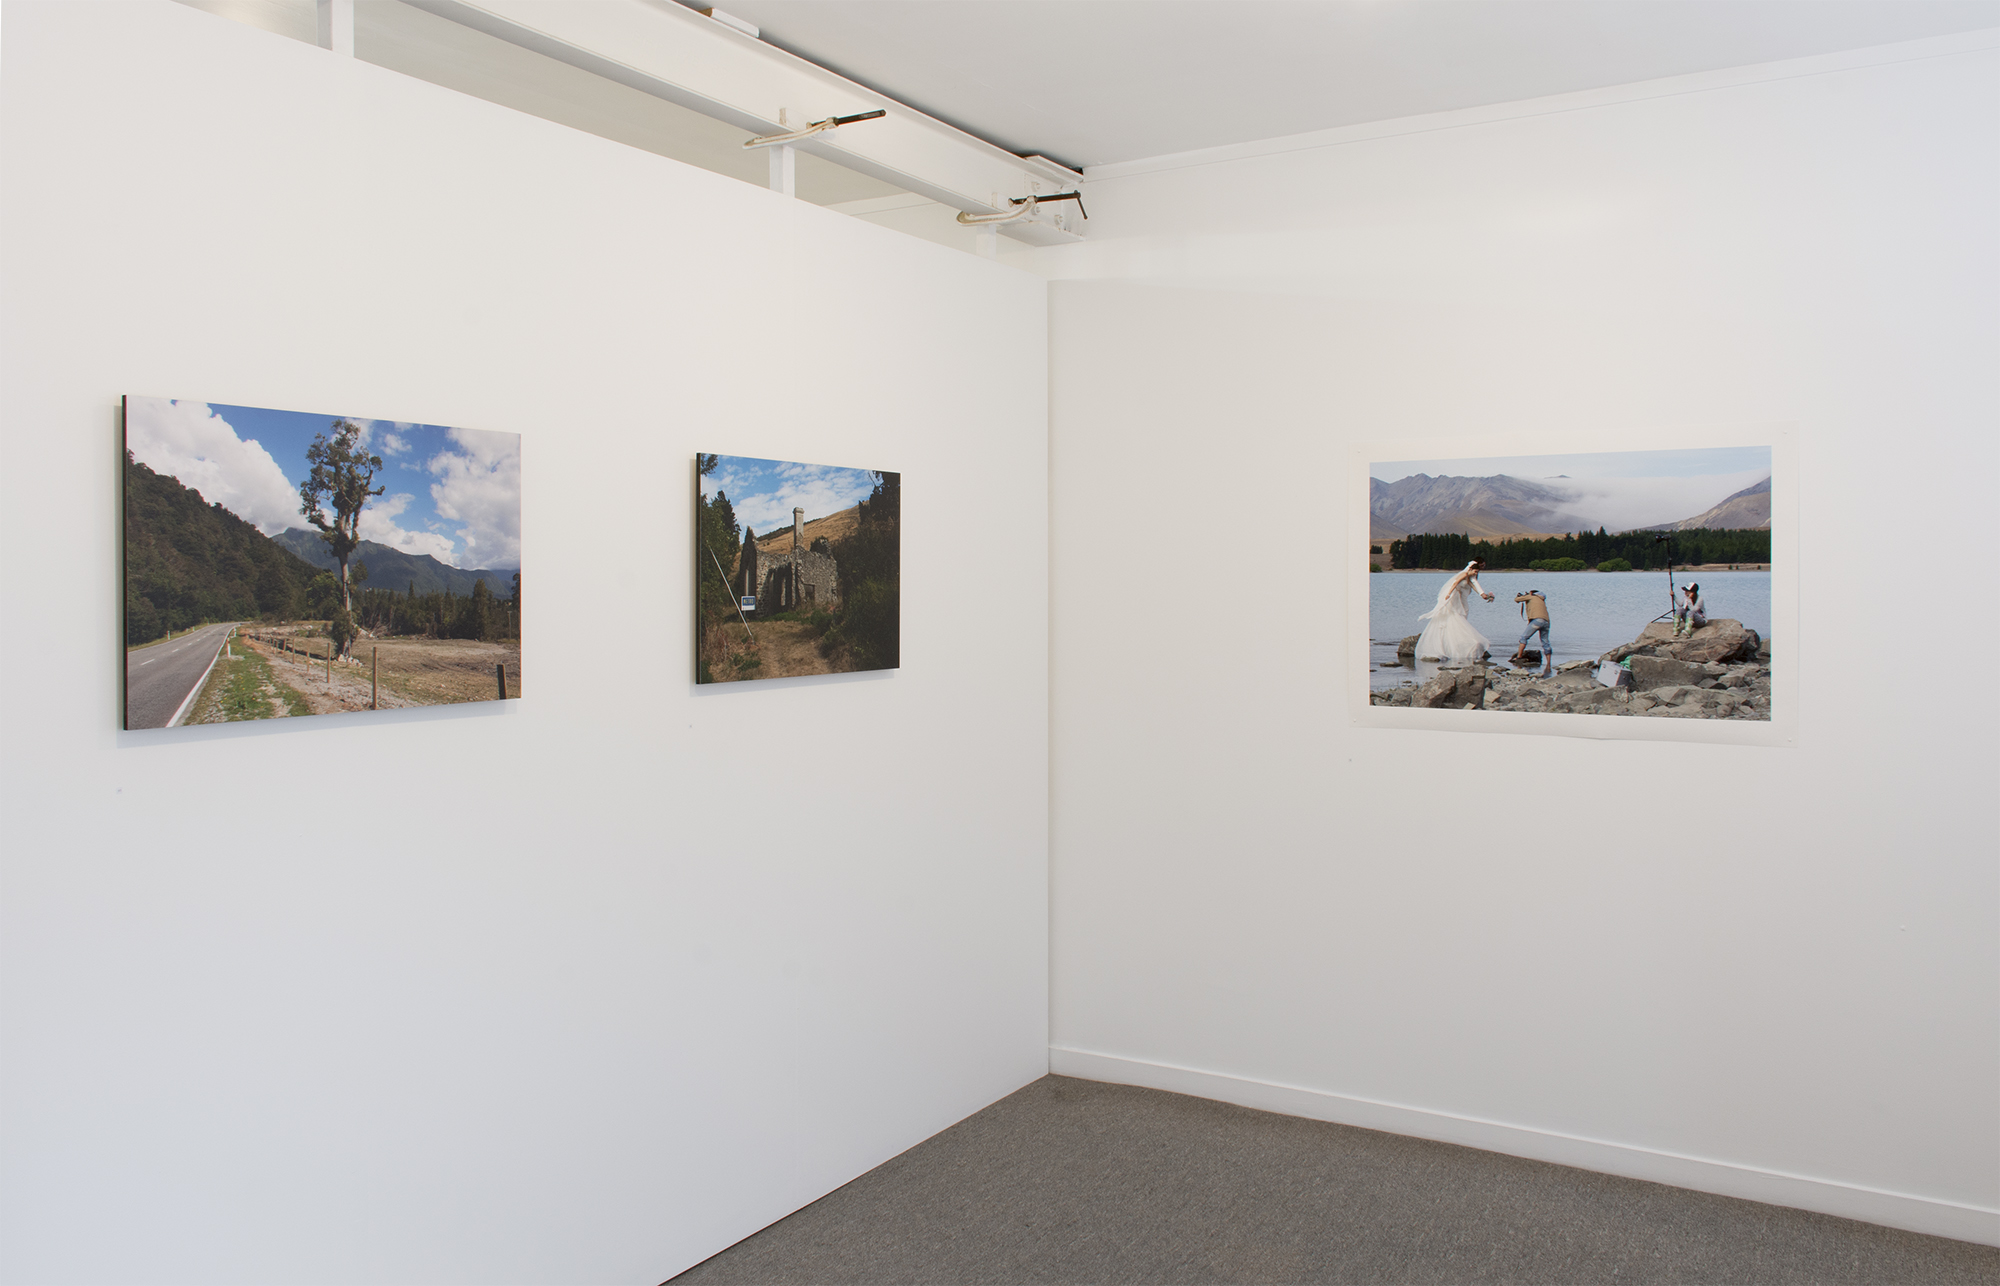 Photospace Gallery Wellington March/April 2017 #3